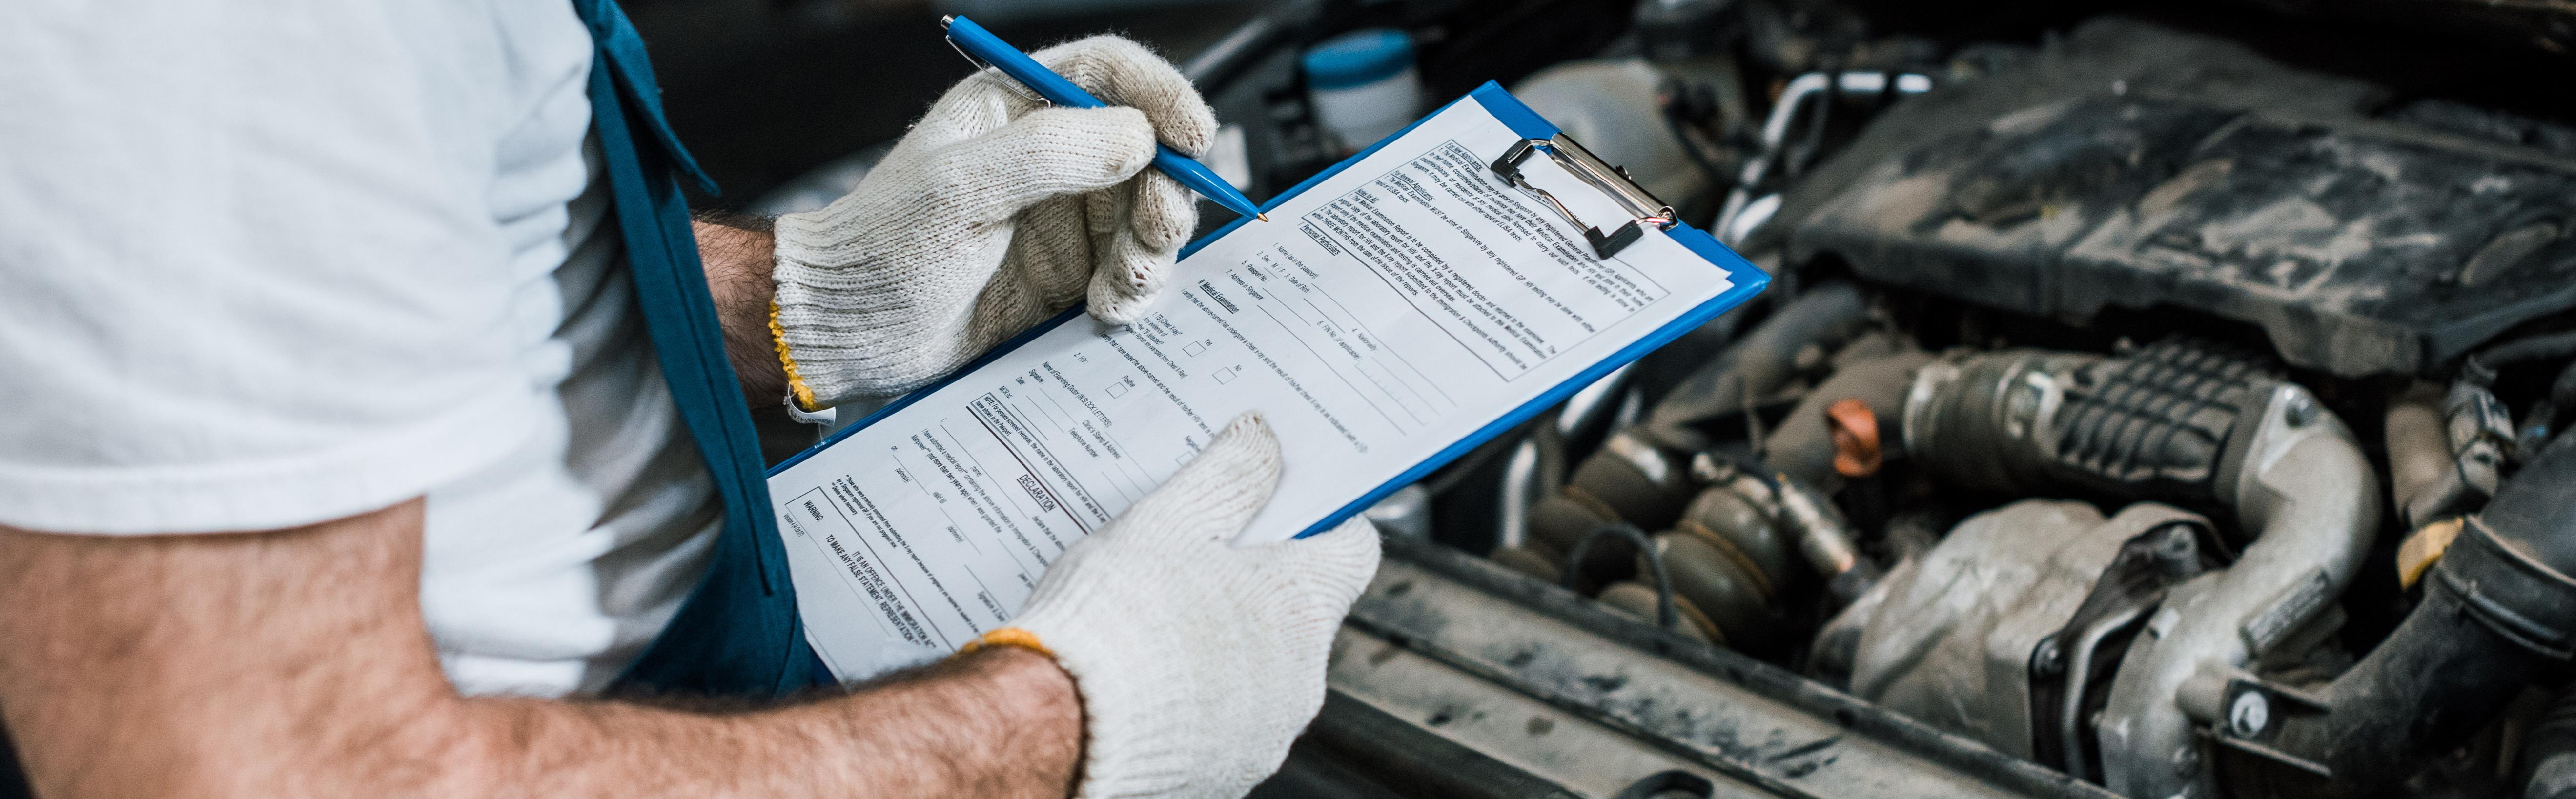 Panoramic Shot Of Repairman Holding Pen And Clipboard Near Car